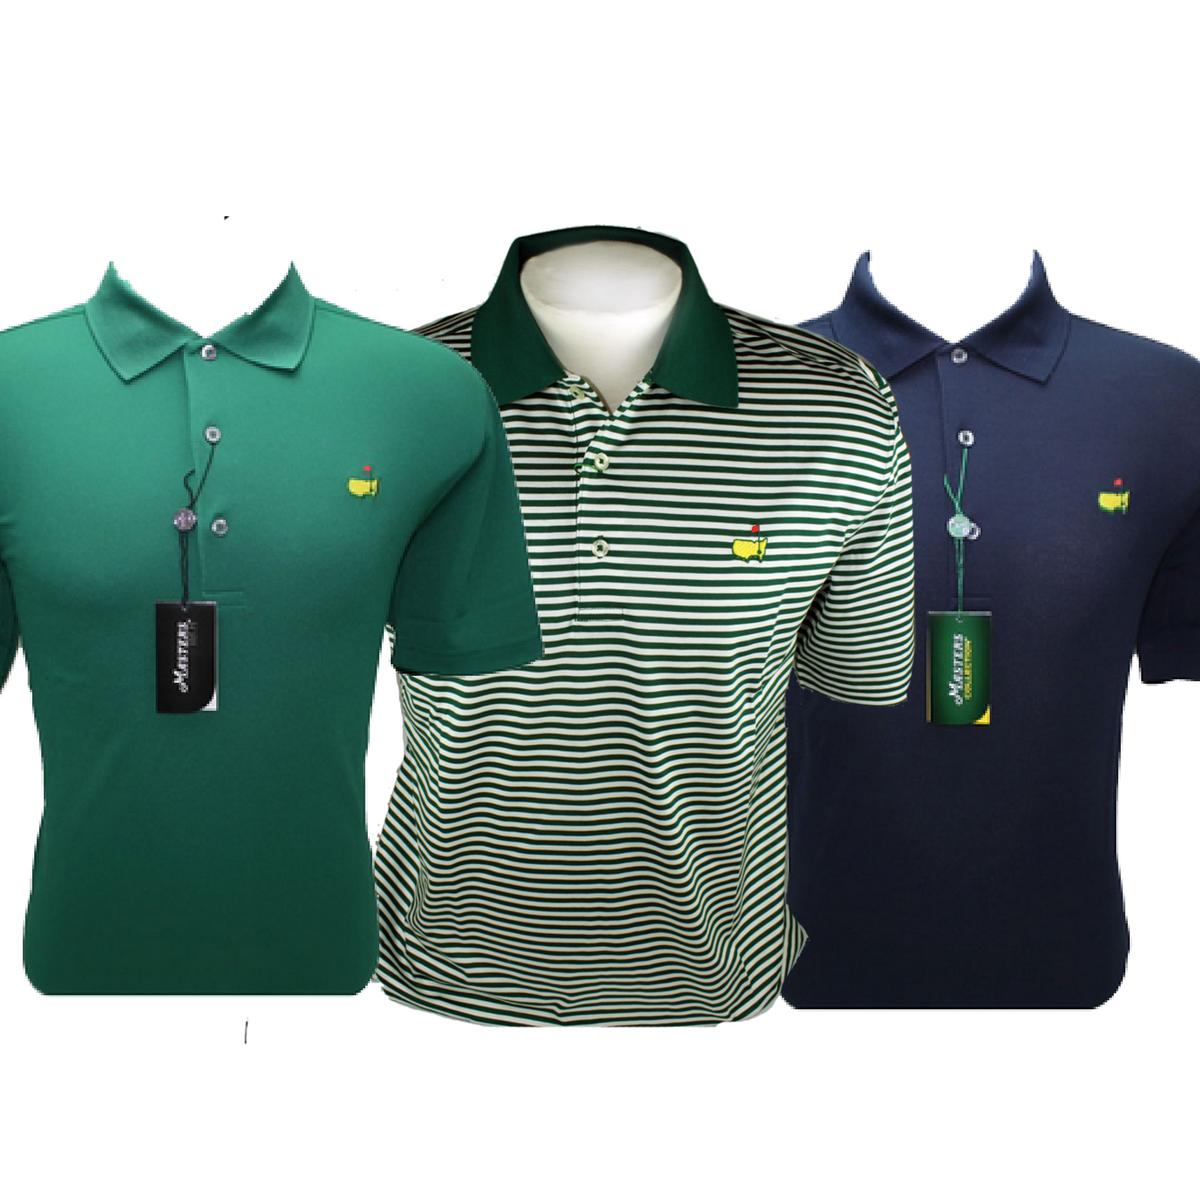 Masters Pique Shirts